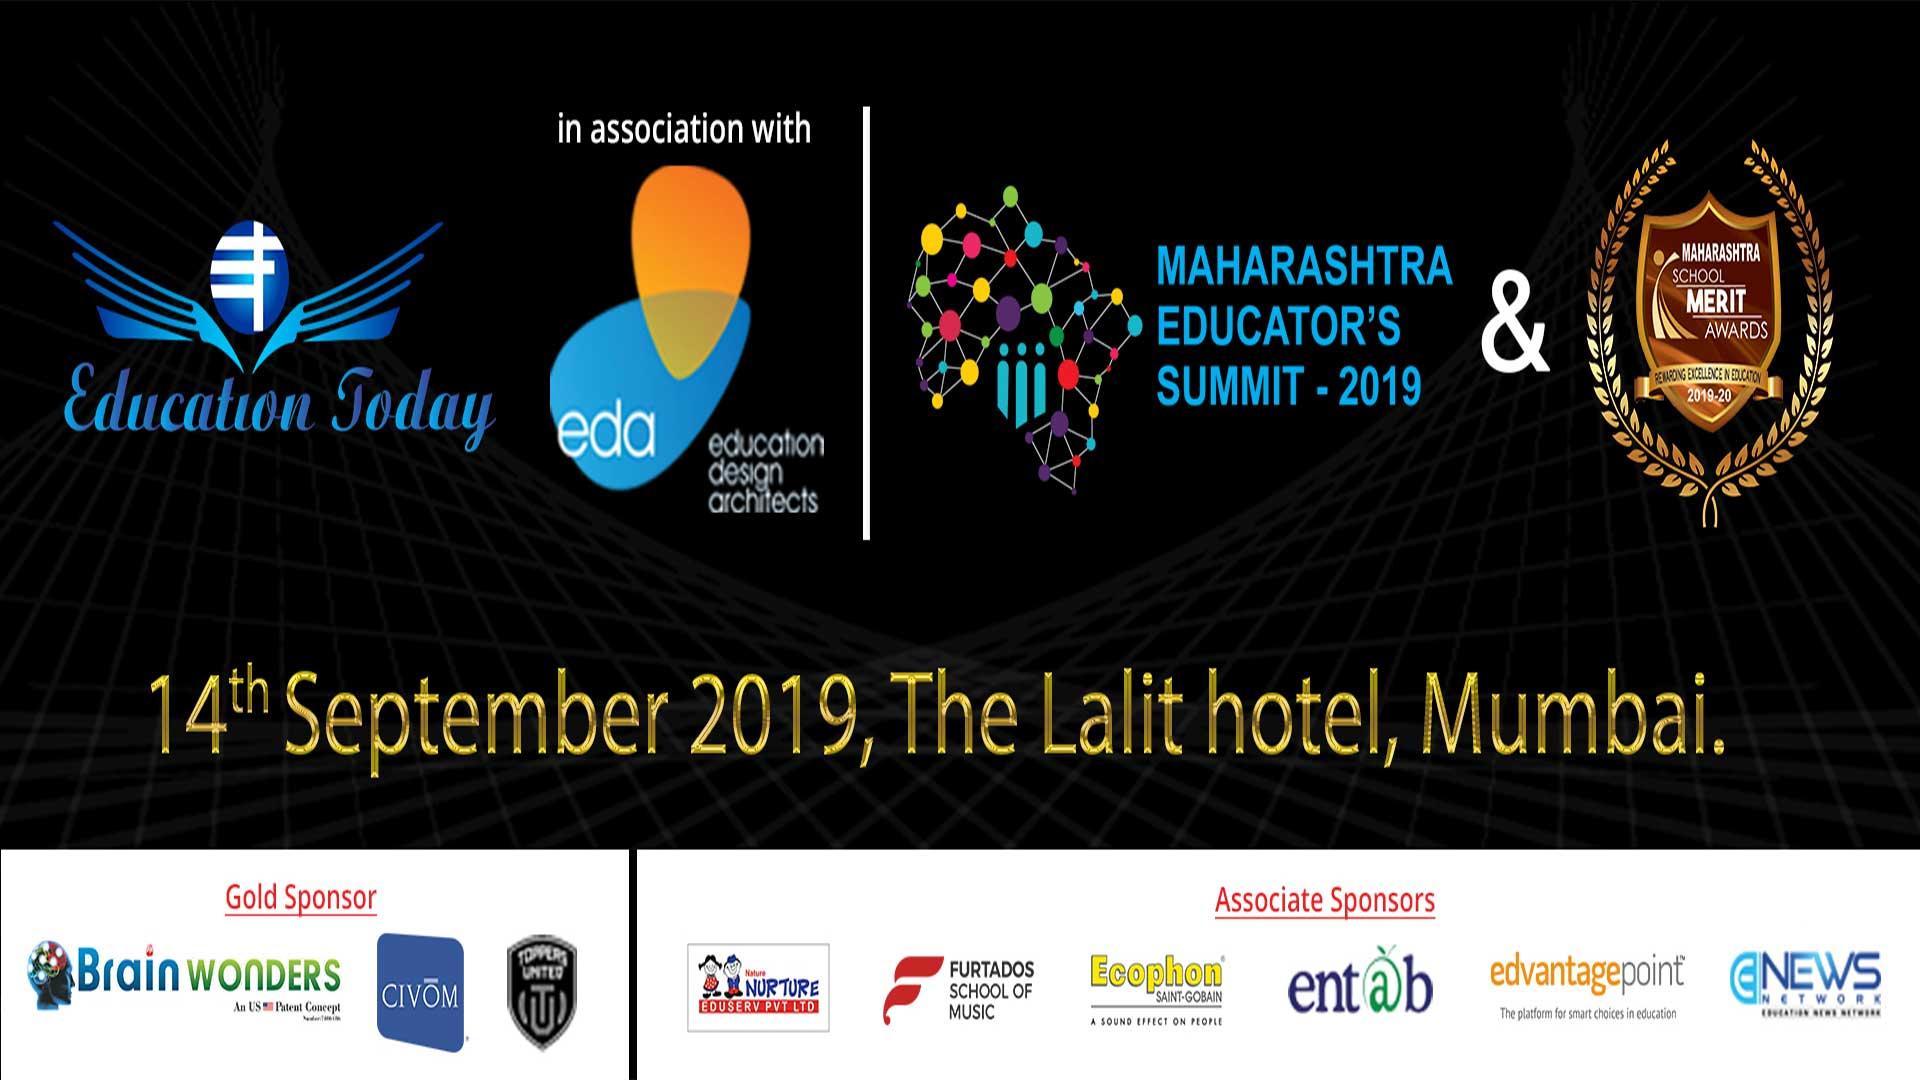 Maharashtra Educators Summit & School Merit Awards - 2019